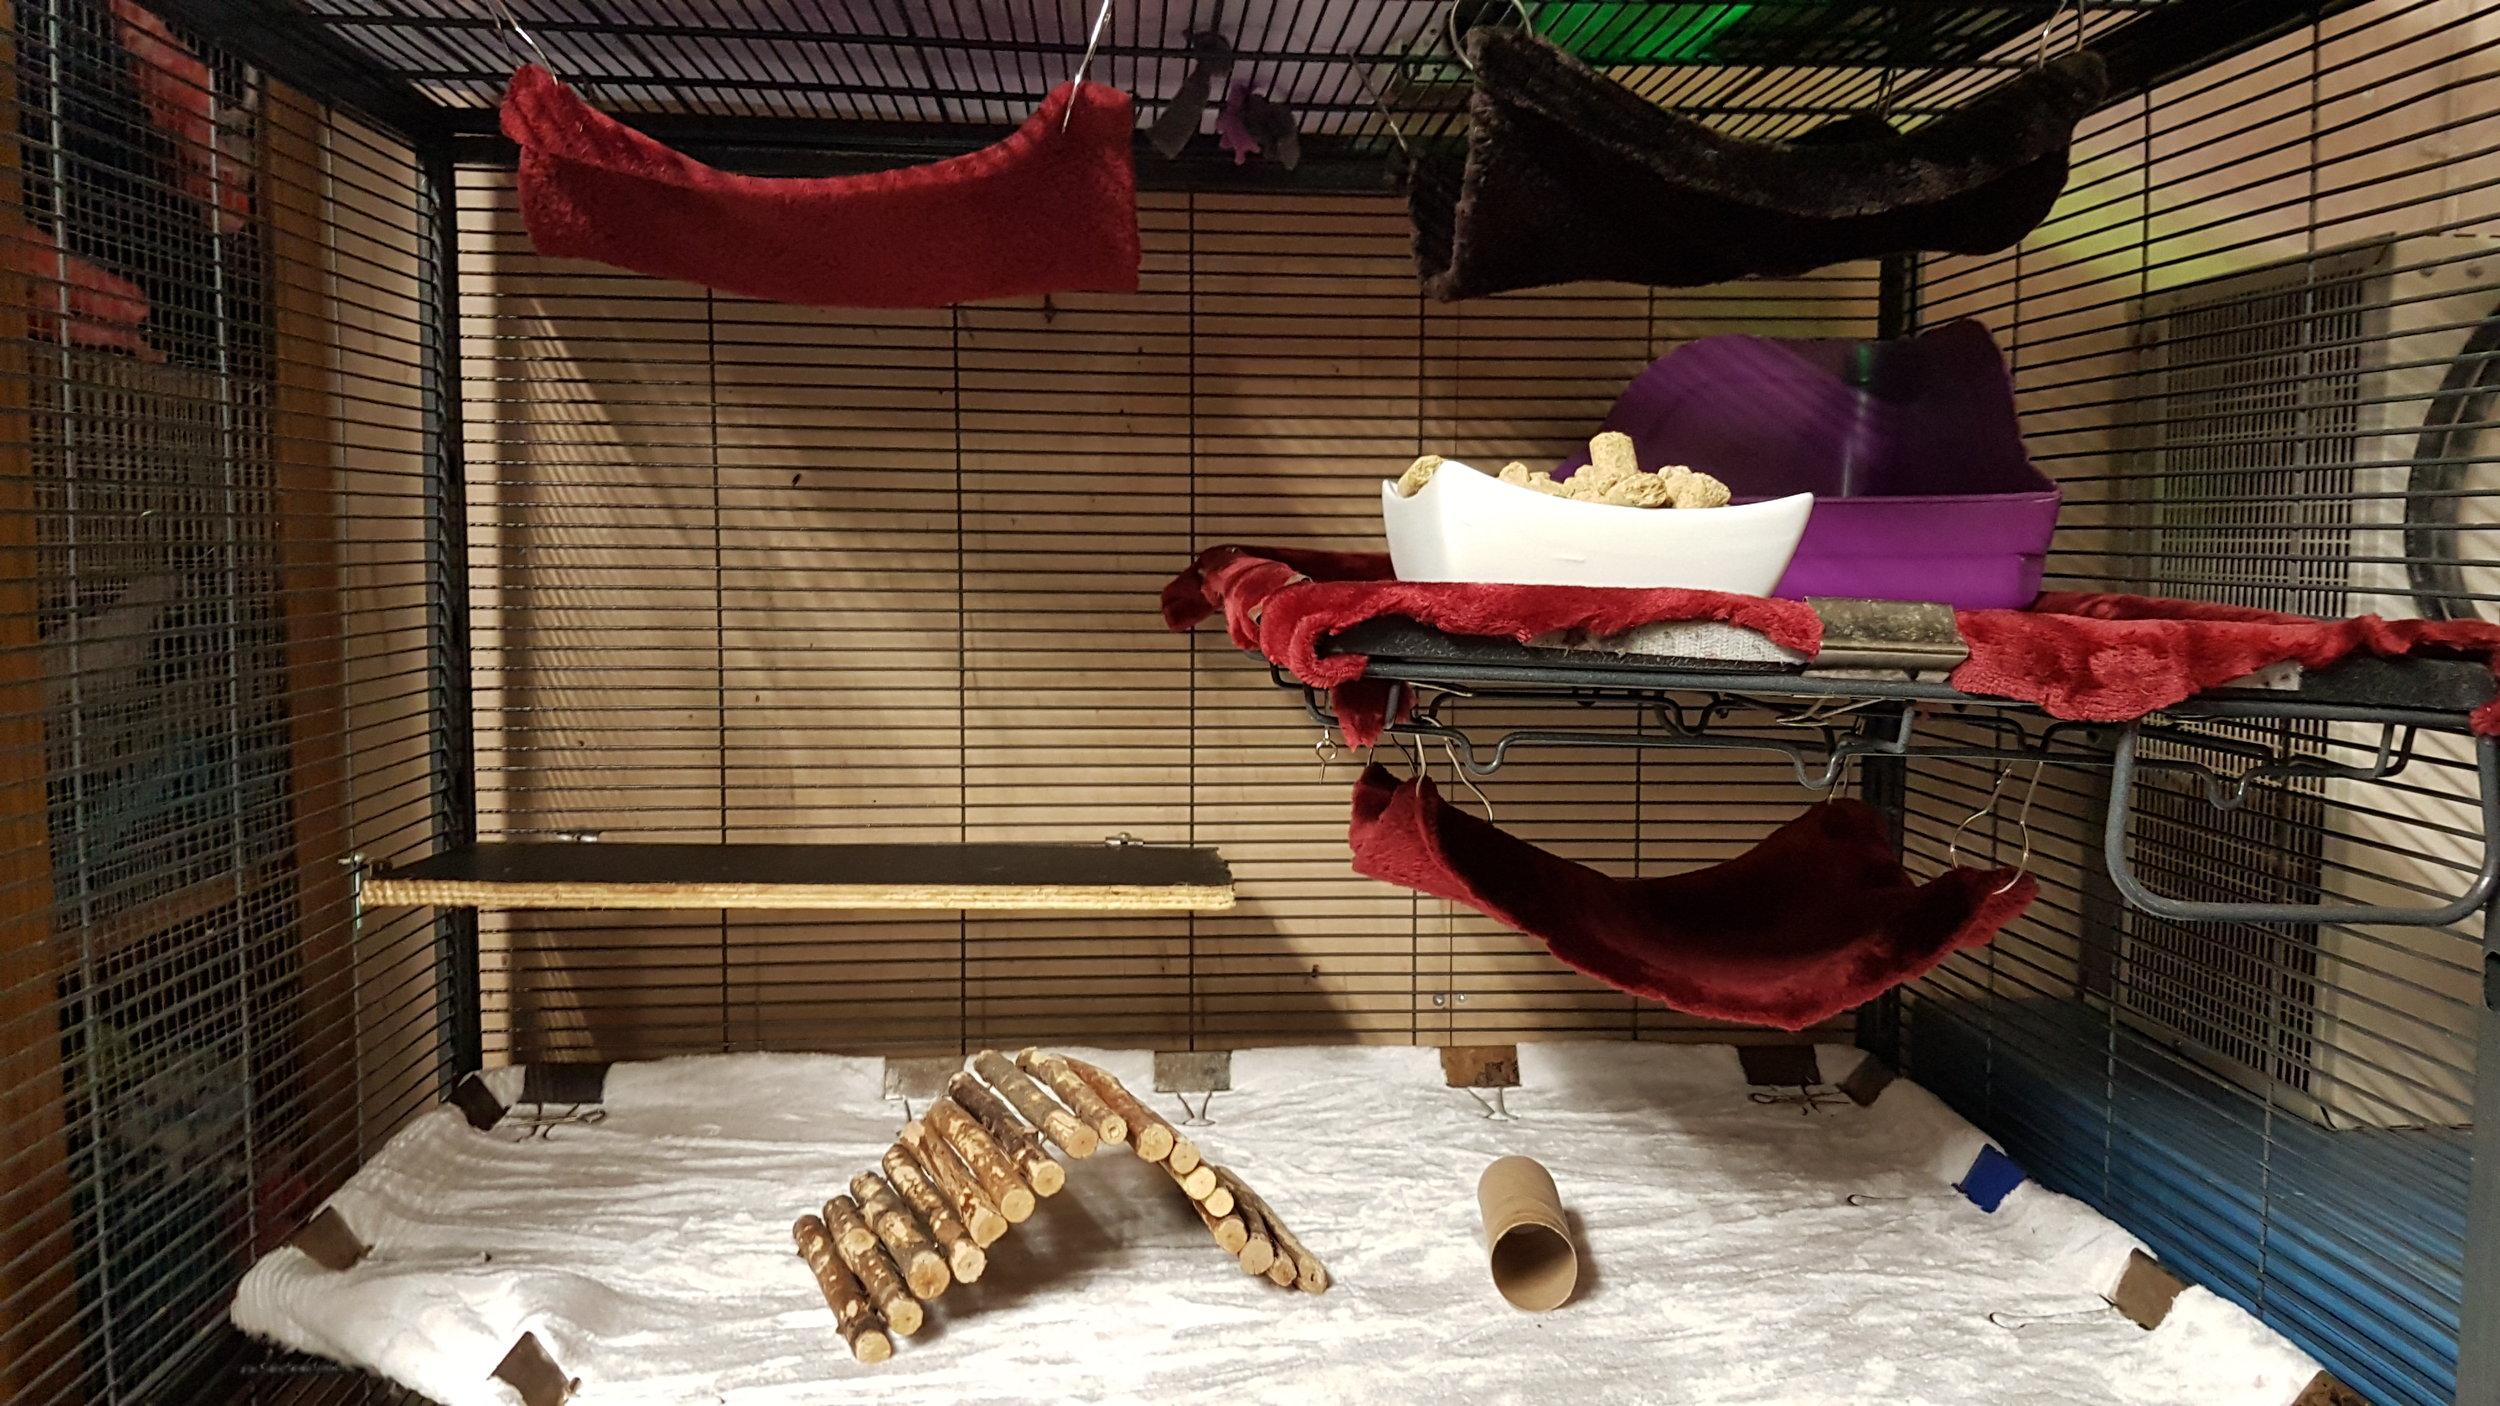 An extra wooden shelf, a wooden hut, toilet paper roll, hammocks, food dish, litter bin